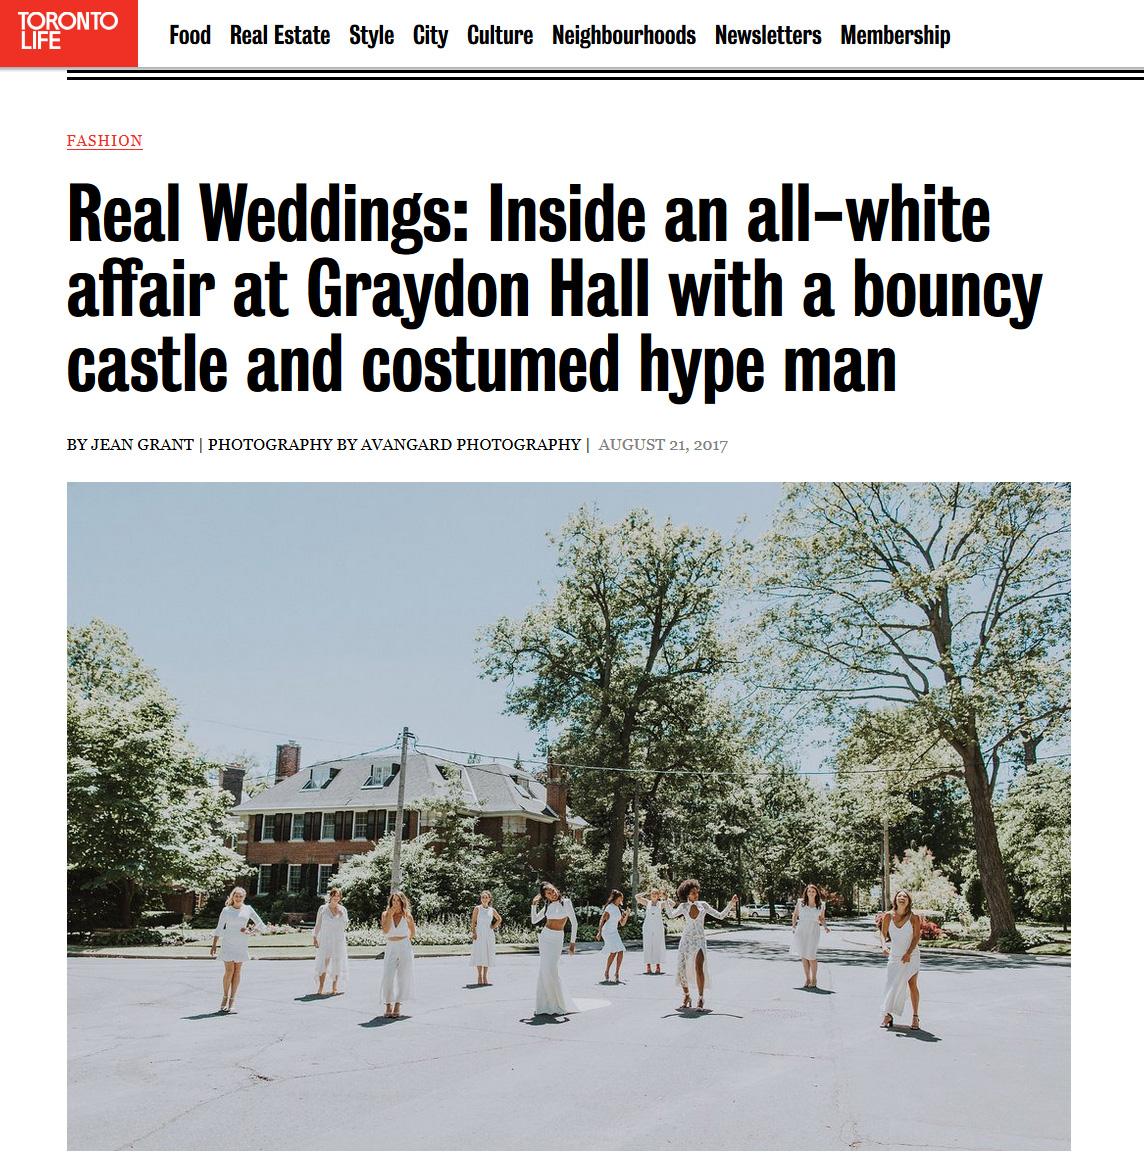 Real Weddings: Inside an all-white affair at Graydon Hall